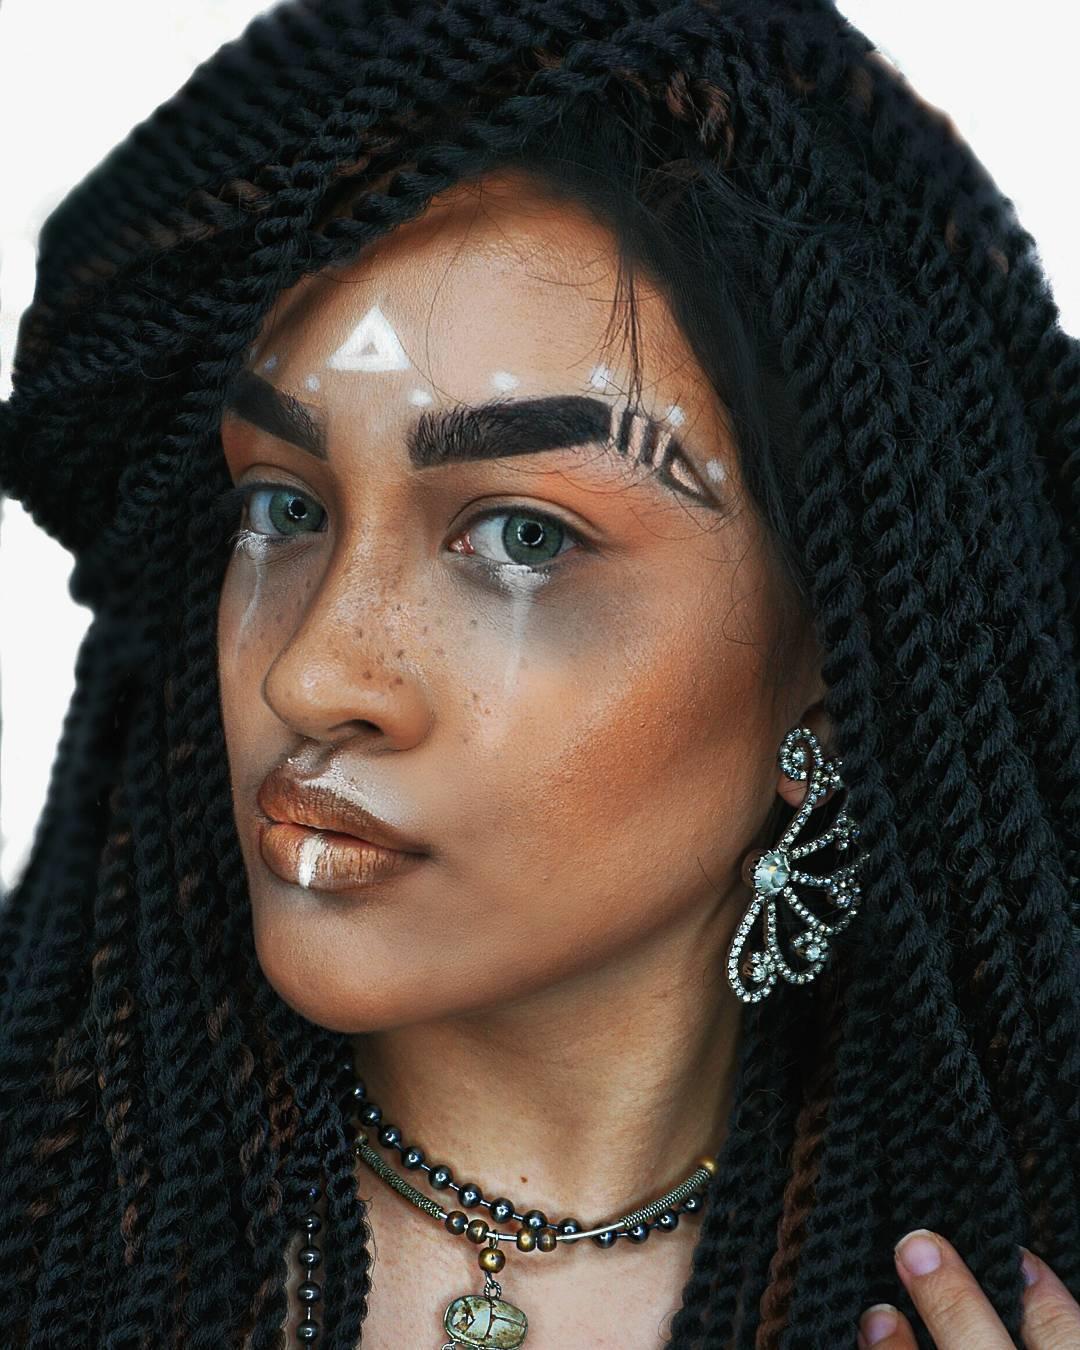 tribal makeup with senagalese twist hair